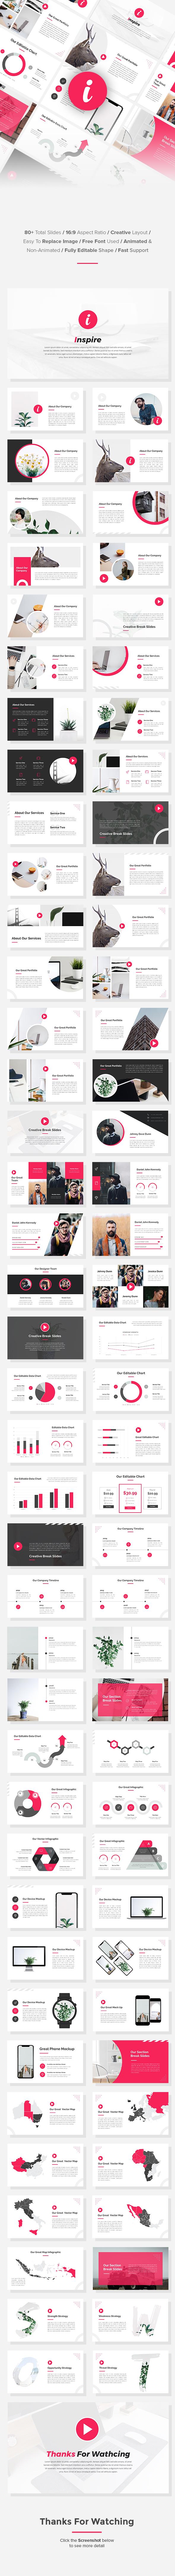 Inspire - Creative PowerPoint Template - Creative PowerPoint Templates